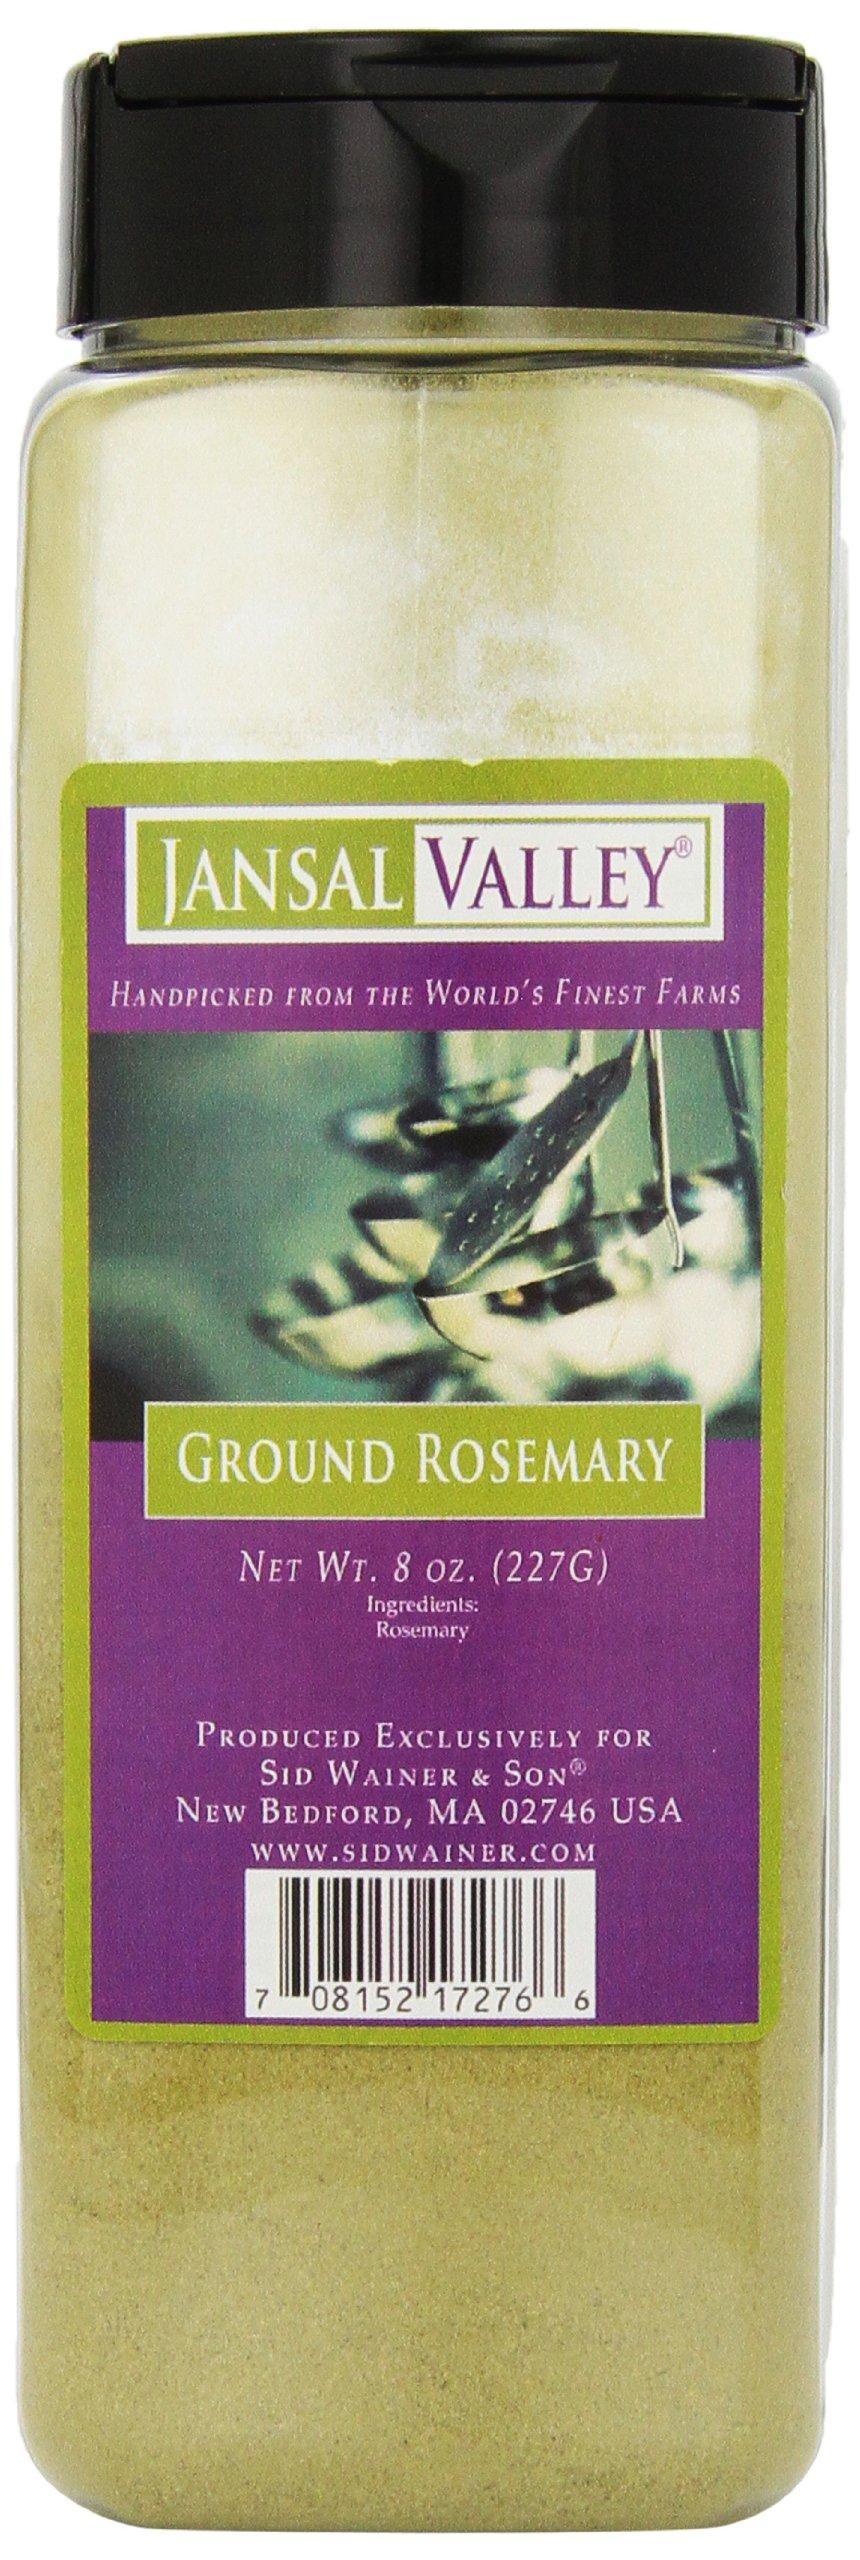 Jansal Valley Ground Rosemary, 8 Ounce